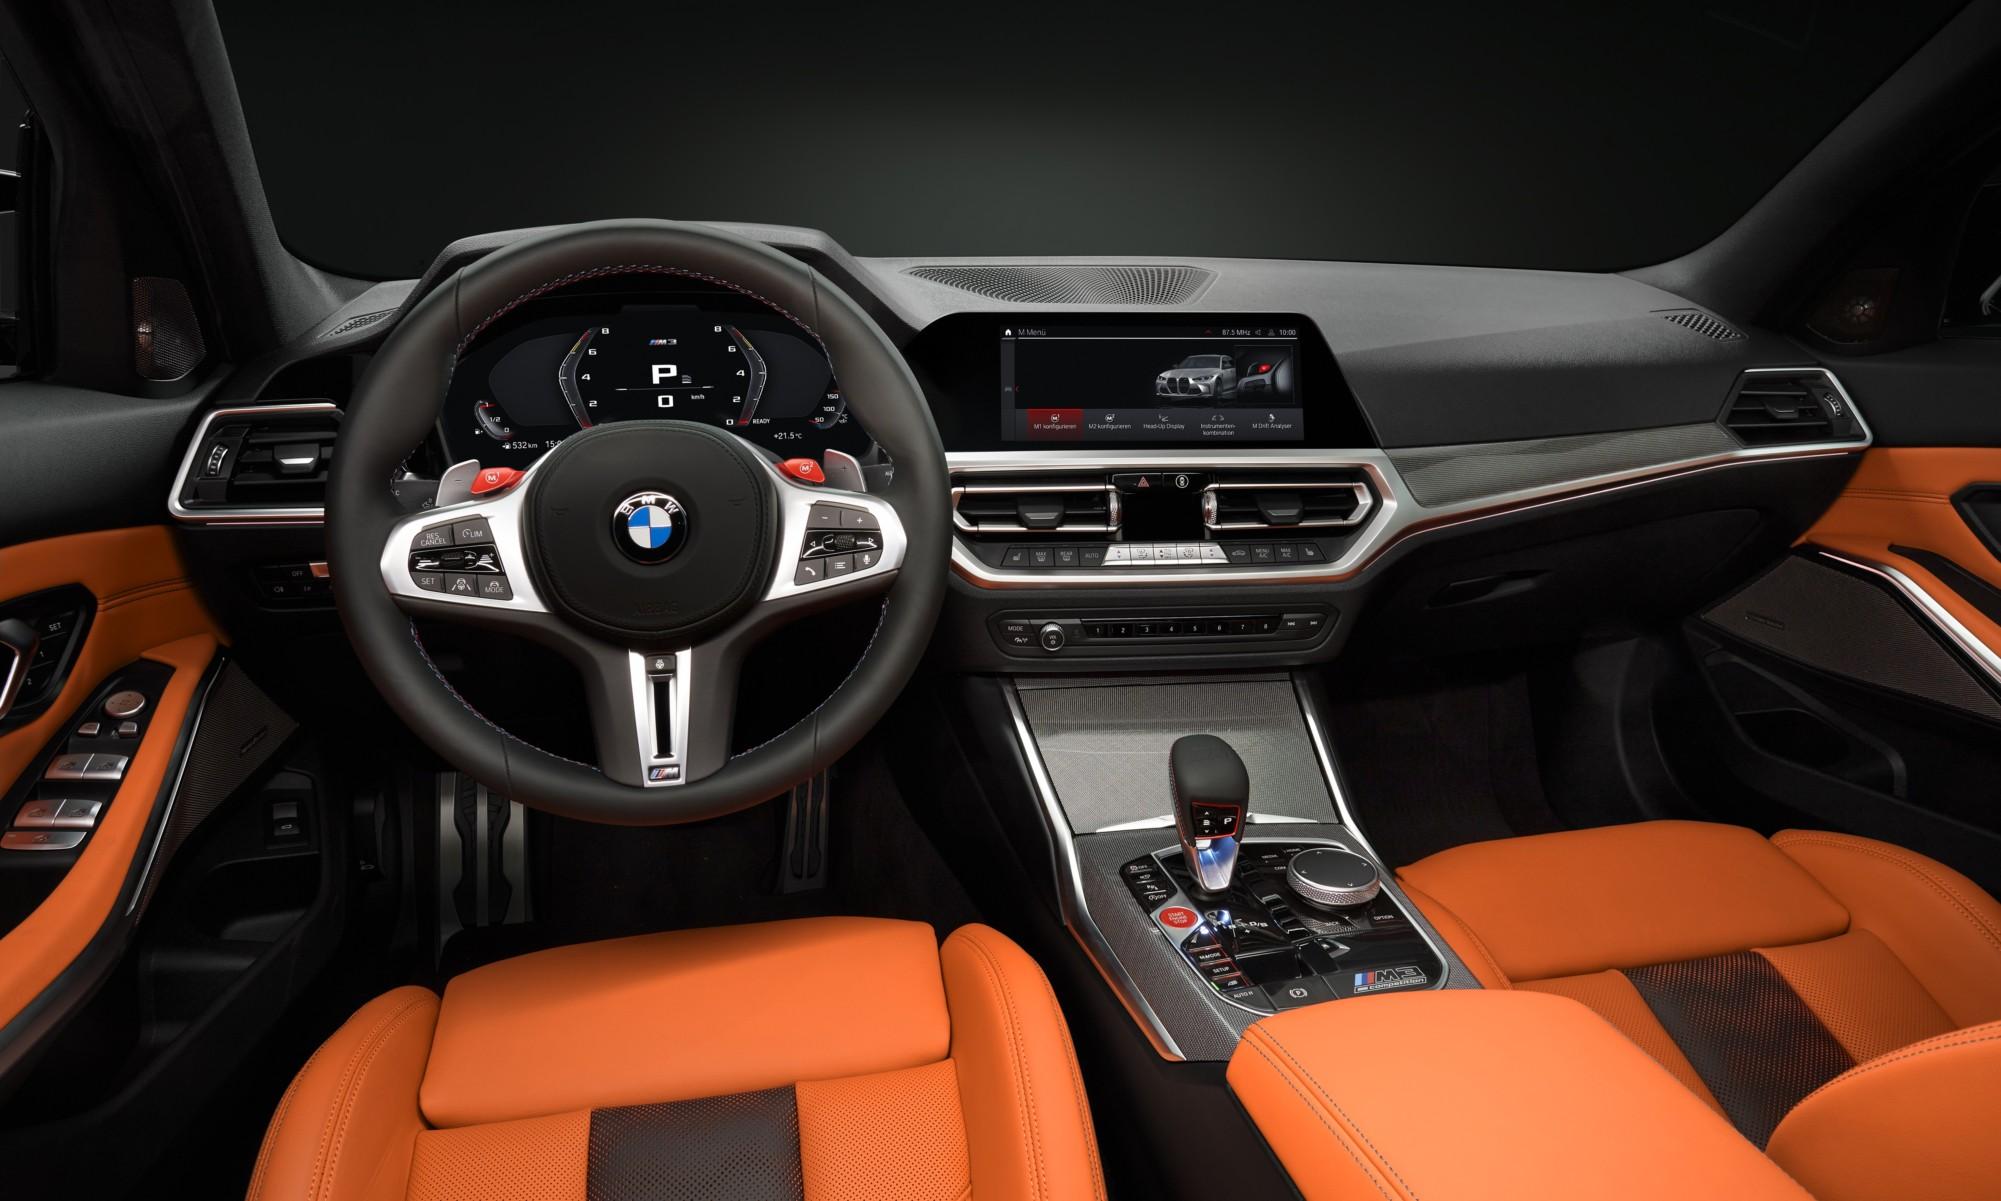 BMW M3 and M4 interior